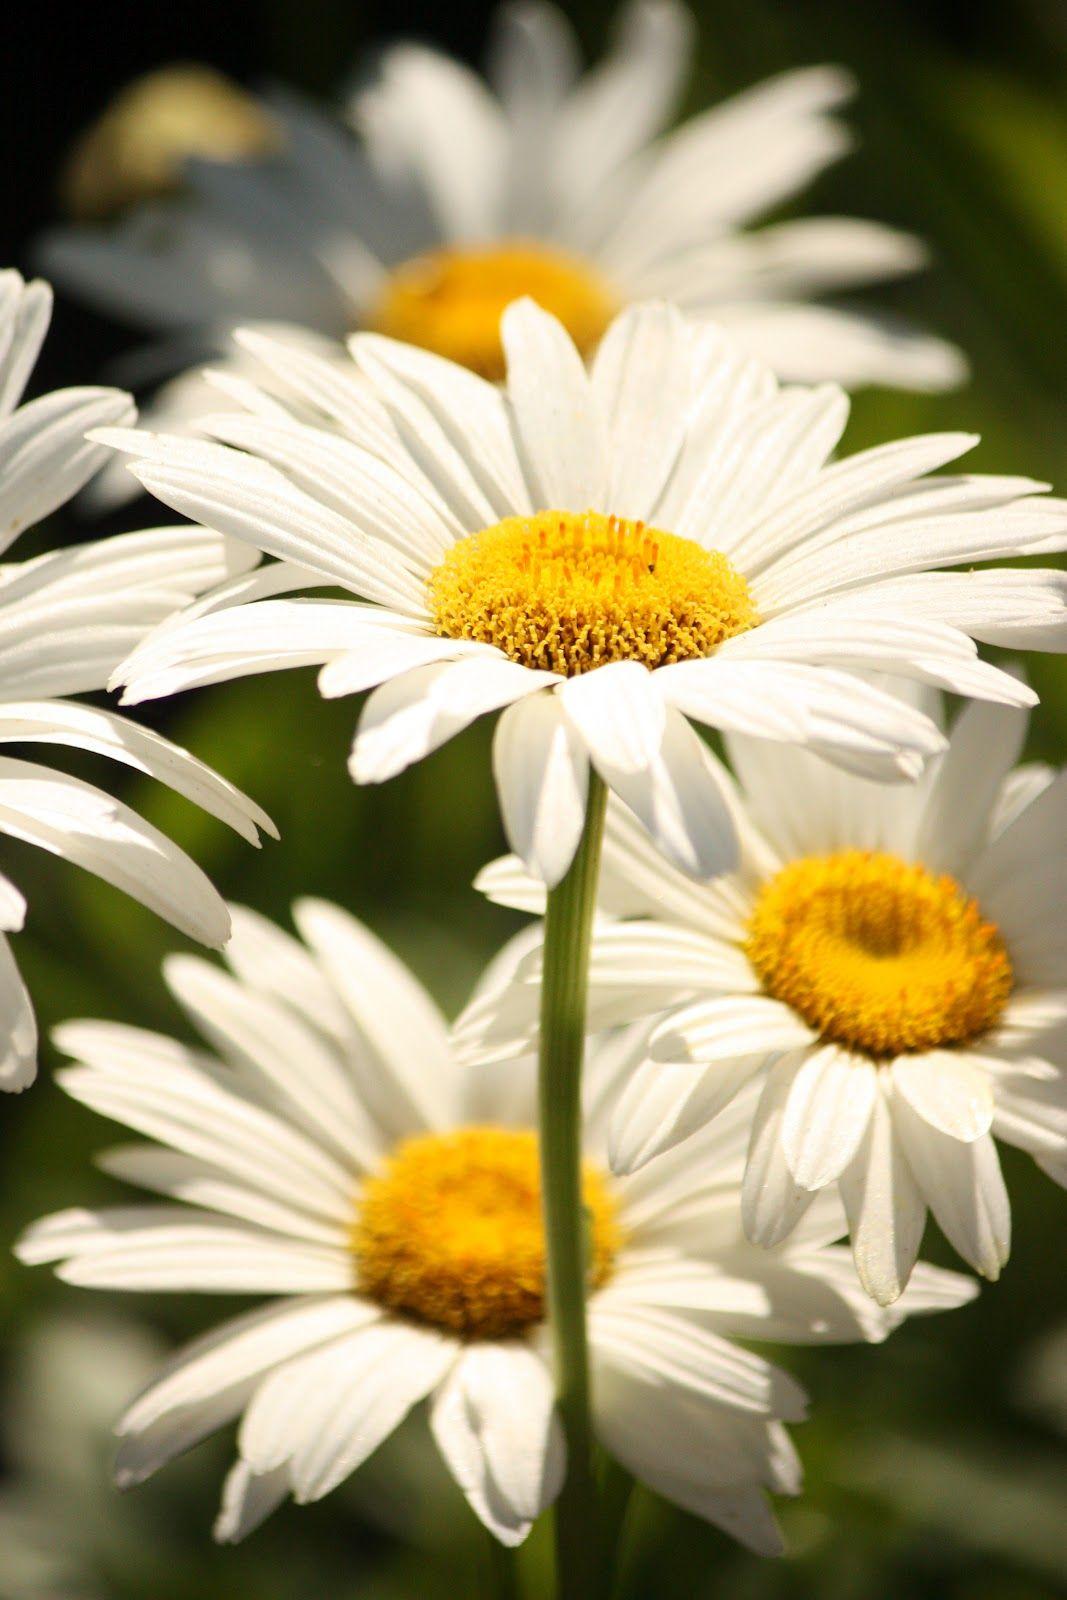 Pin By Devon Adams On Tat Tat Tatted Up Pinterest Flowers Daisy